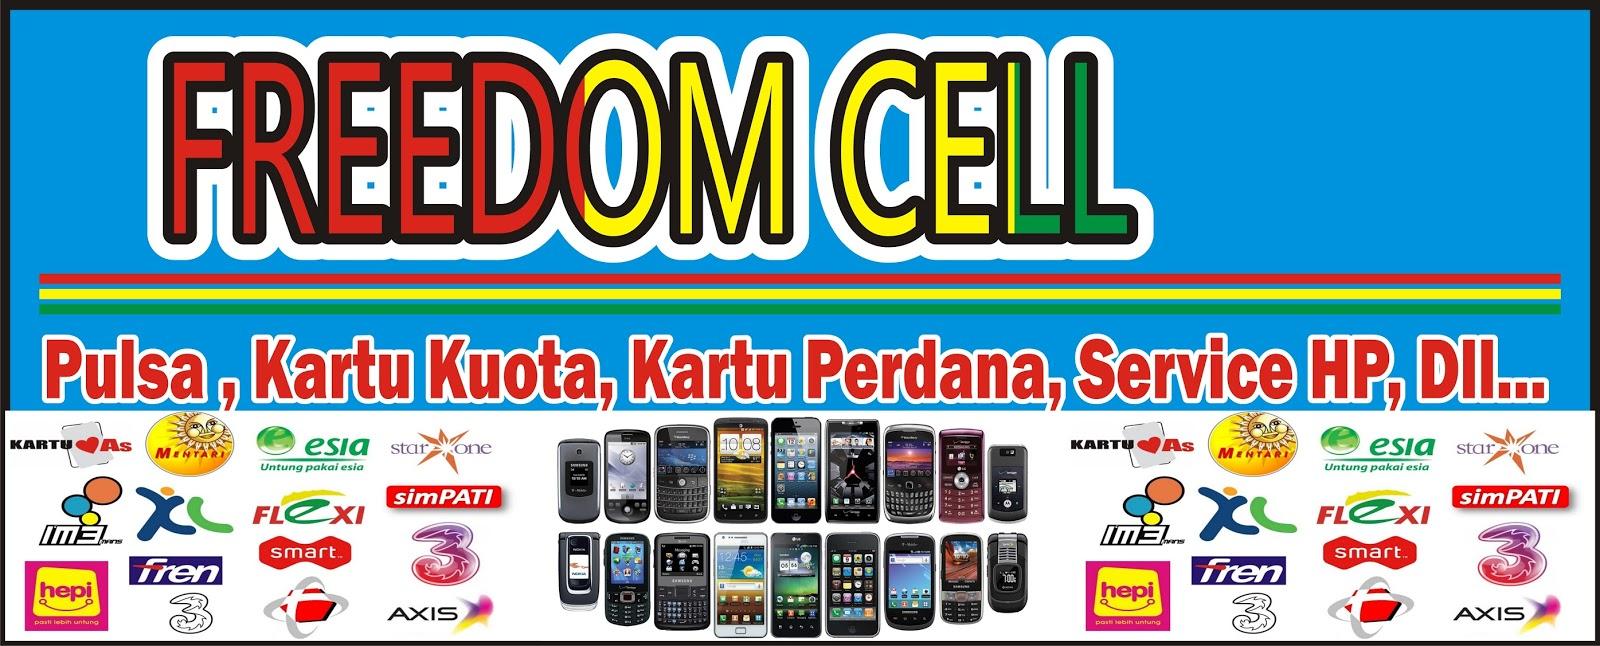 Image Result For Agen Pulsa Bandung